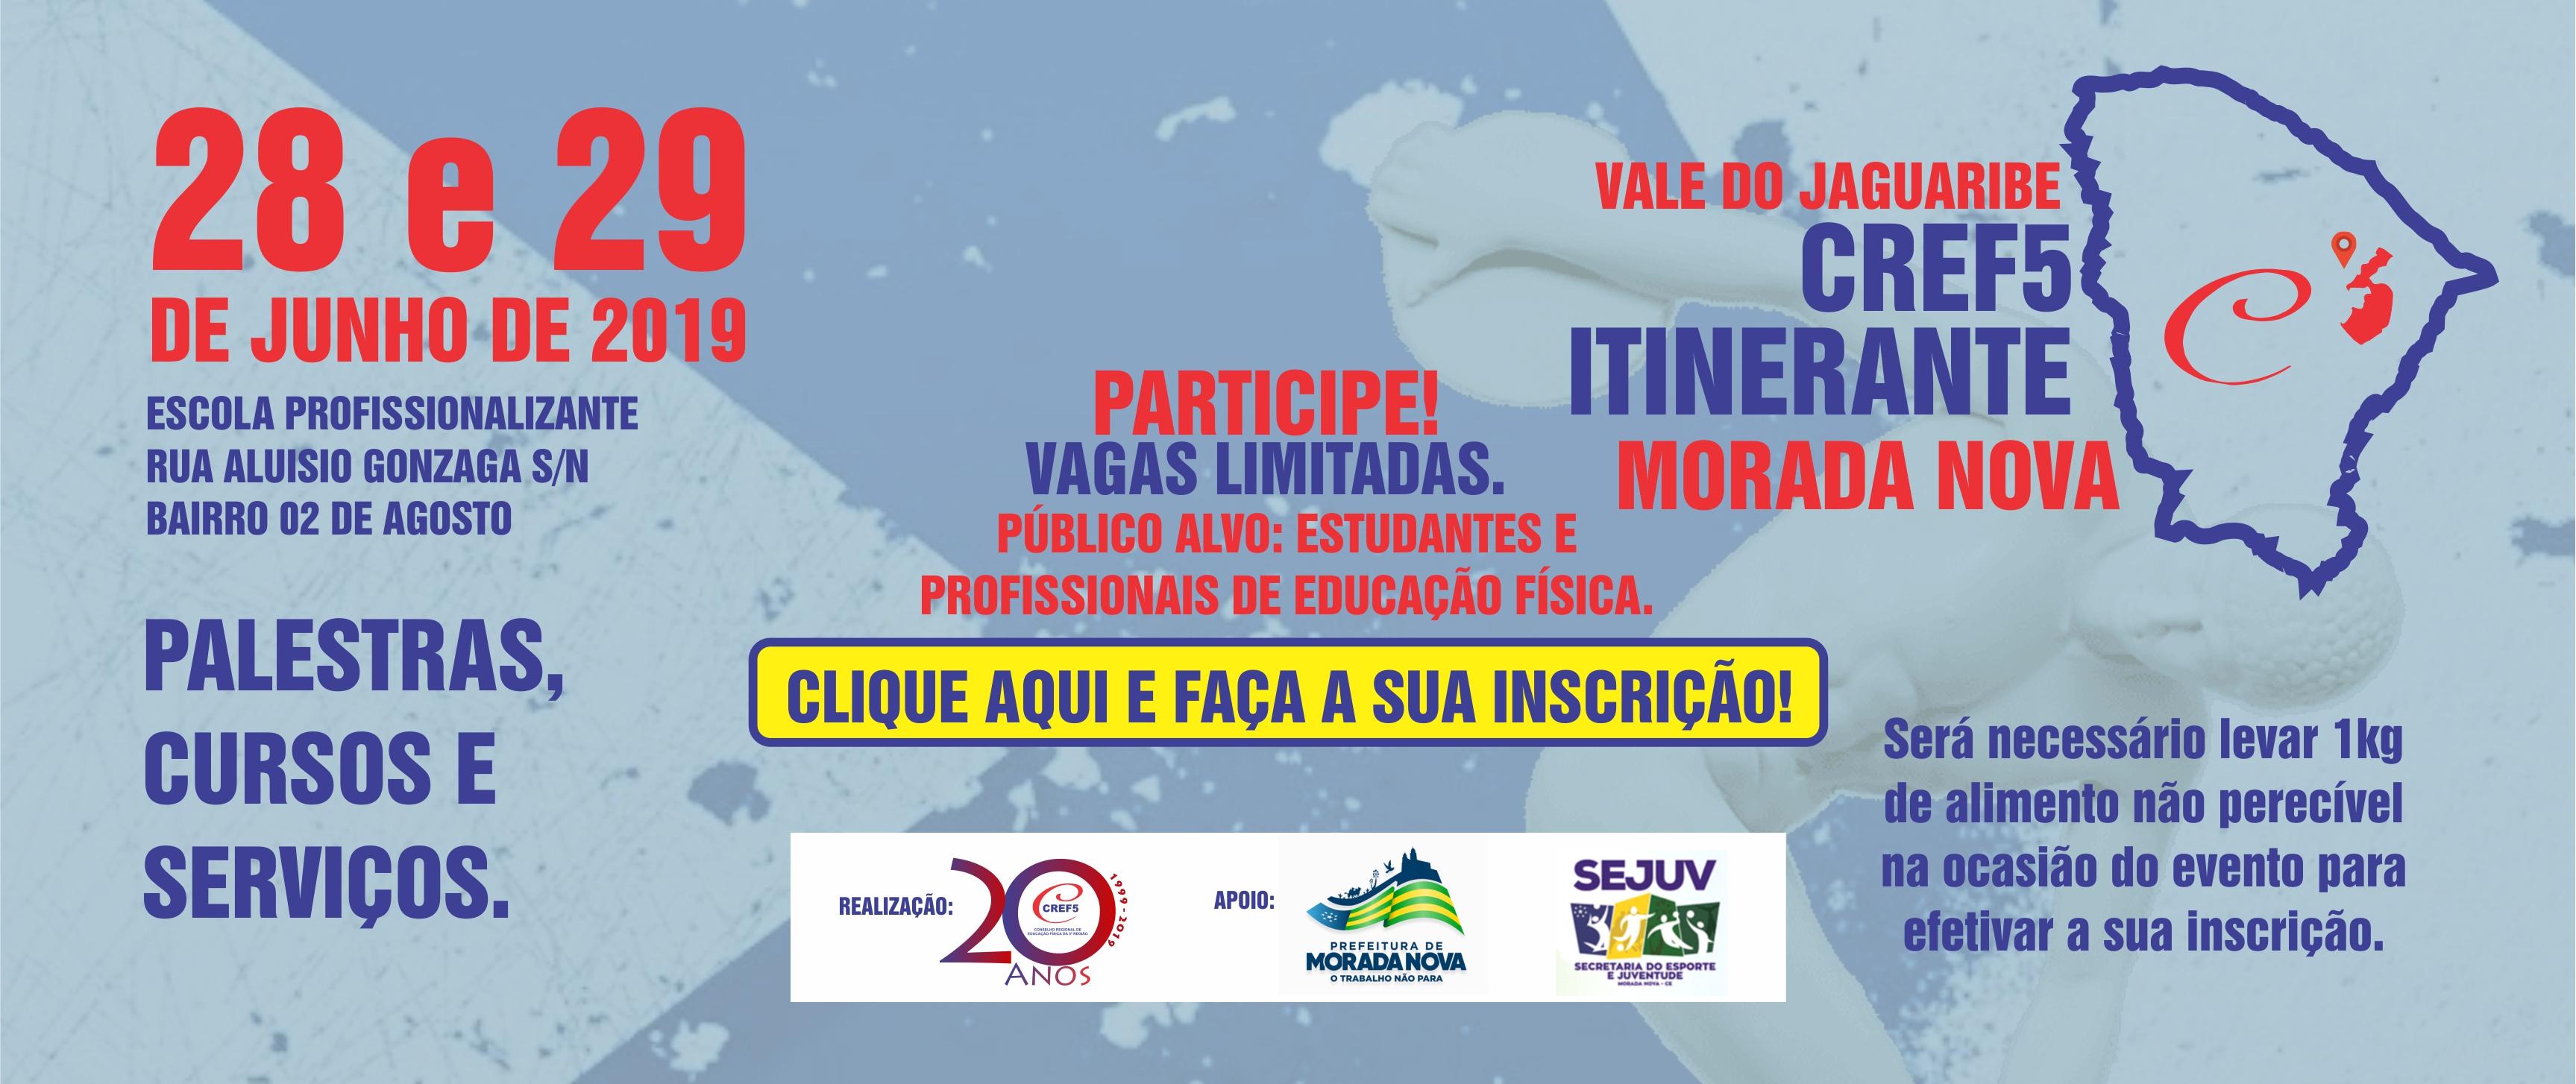 CREF5 ITINERANTE: MORADA NOVA